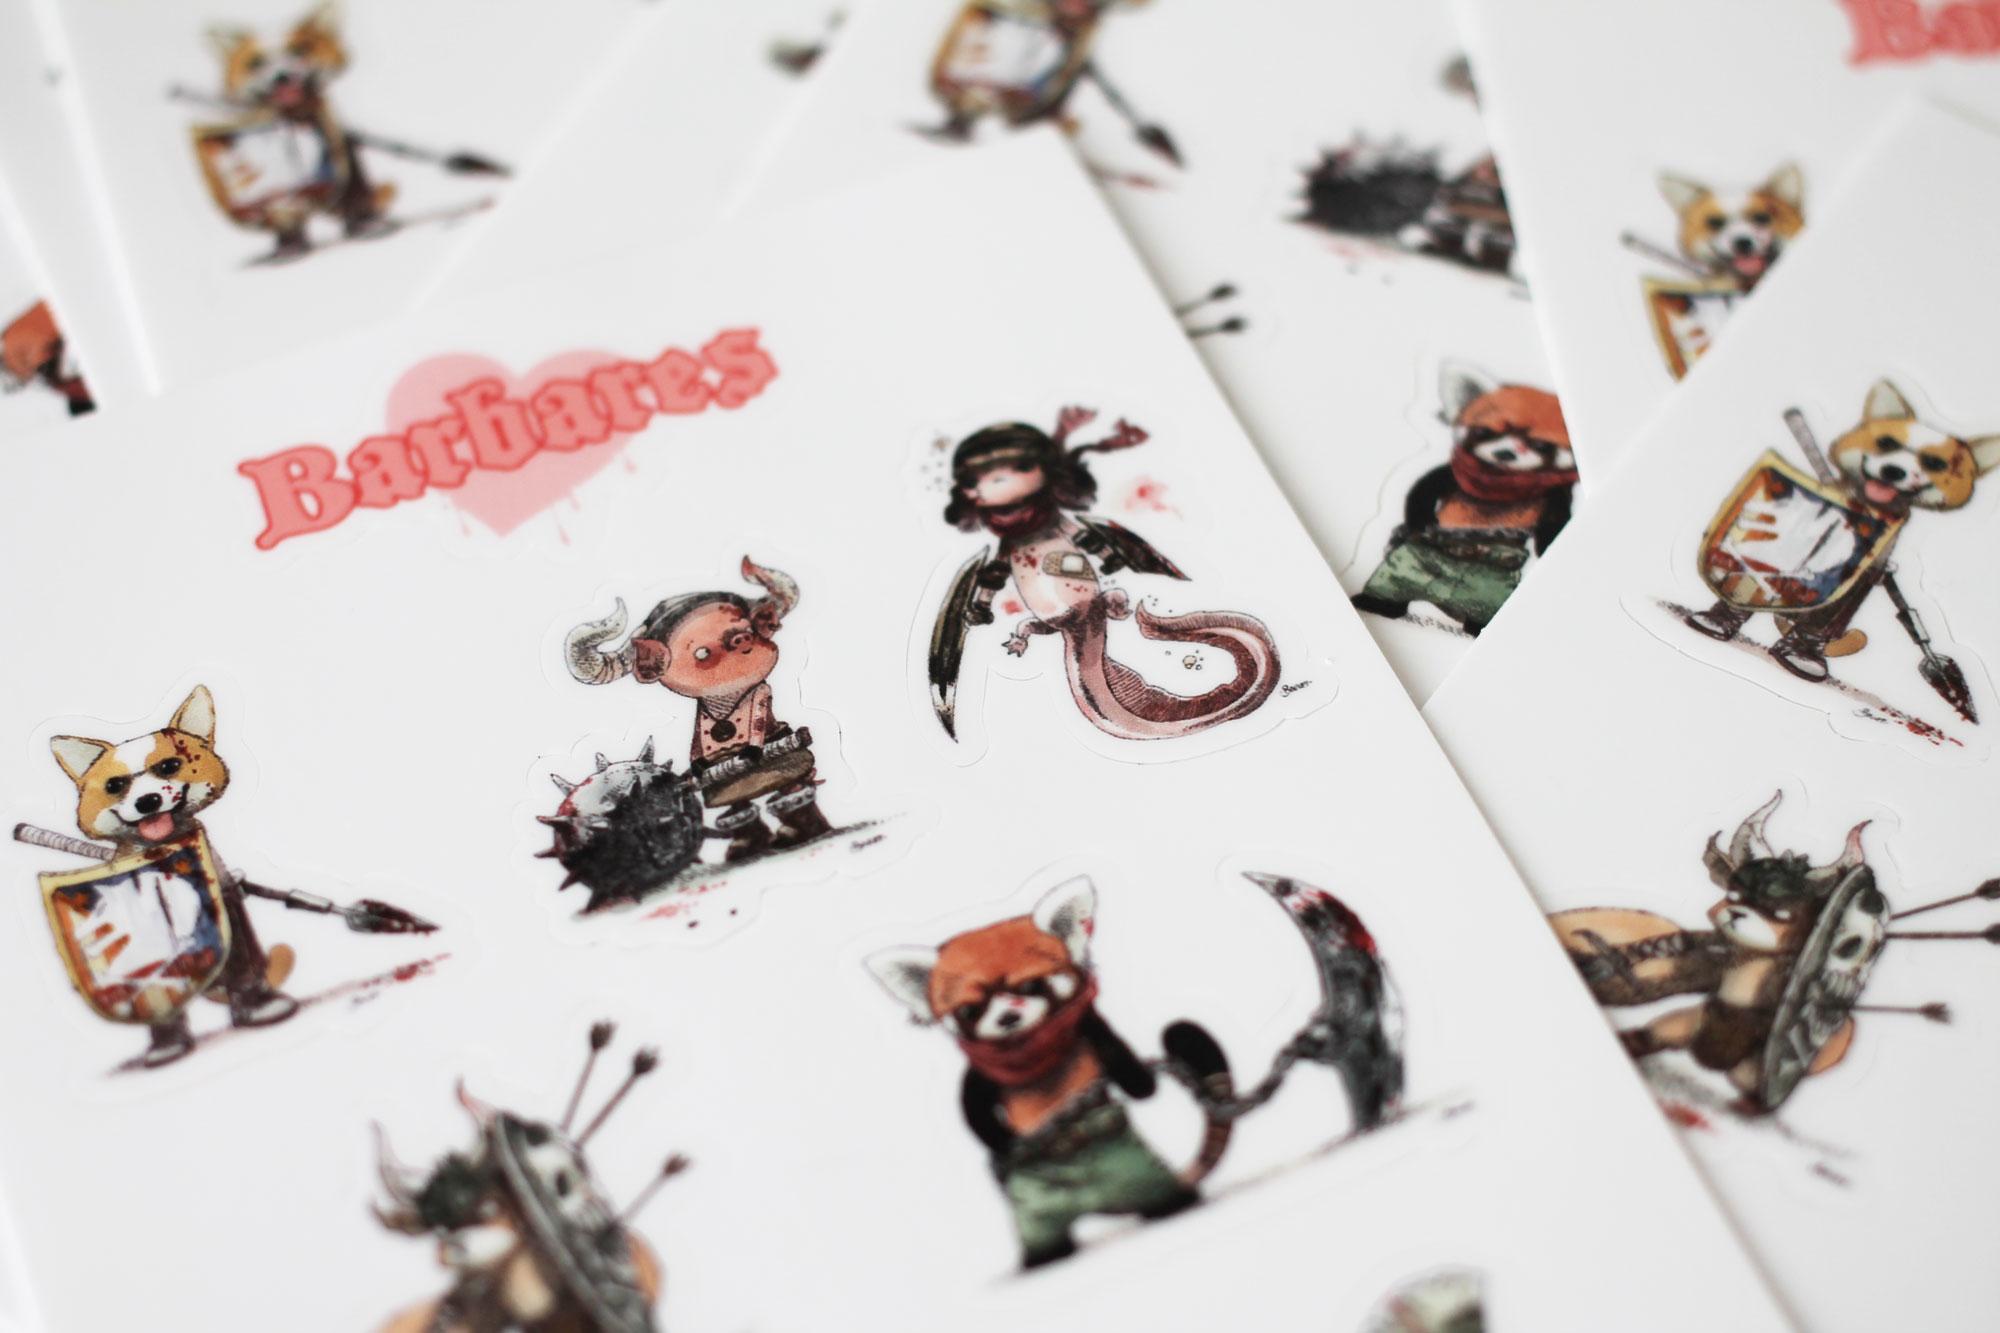 Planche de stickers barbares by Boulet